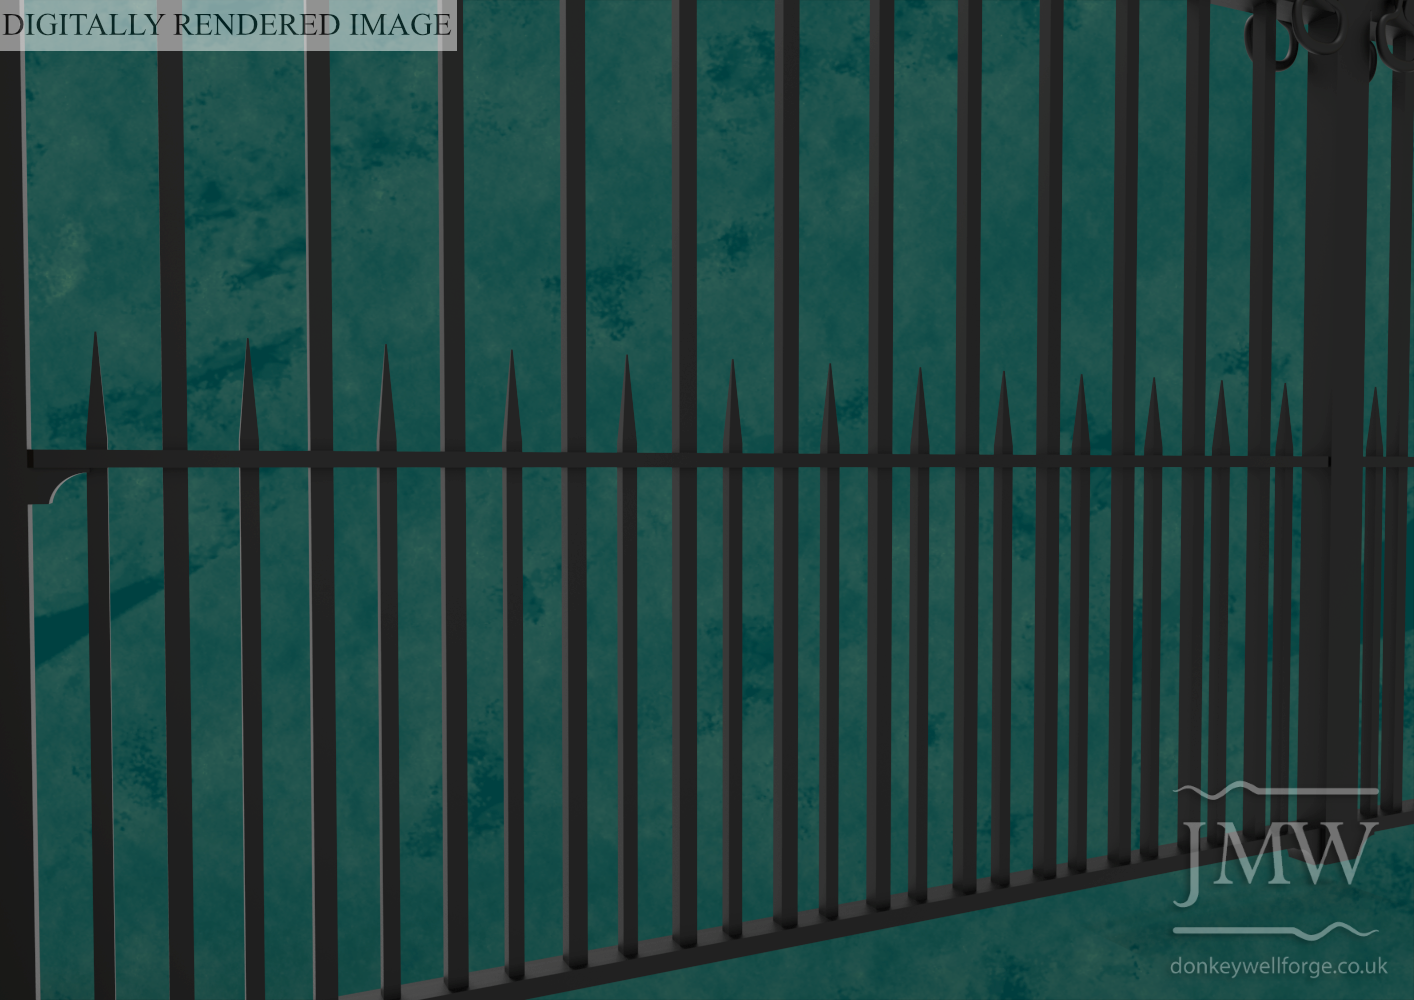 digital-image-Ornate-traditional-forged-dog-bars-gates